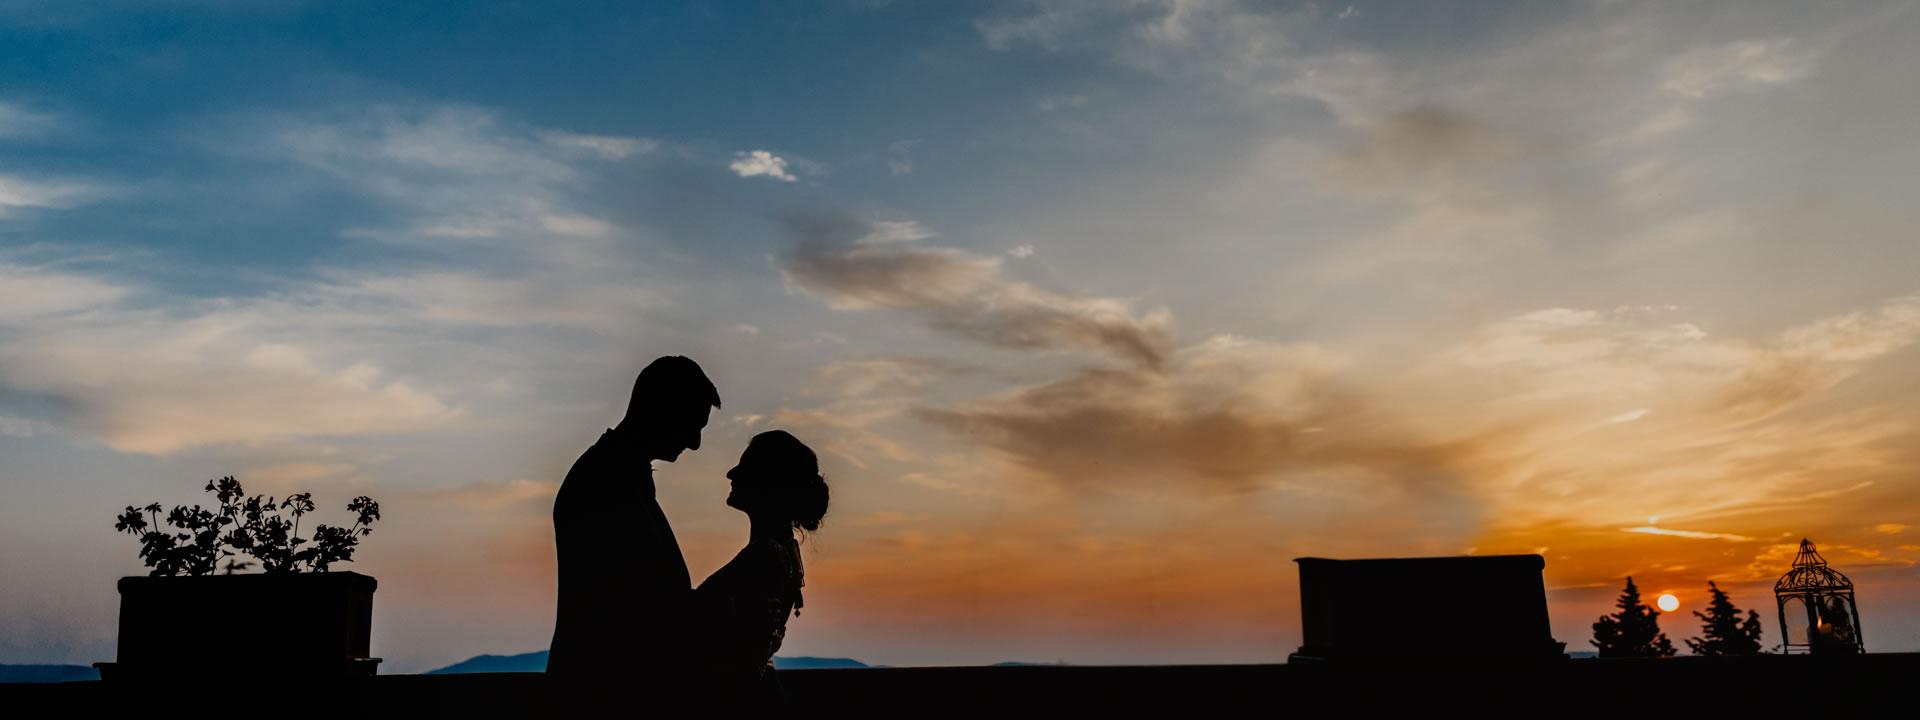 - 55 :: Indian wedding ceremony at Villa Pitiana :: Luxury wedding photography - 54 ::  - 55